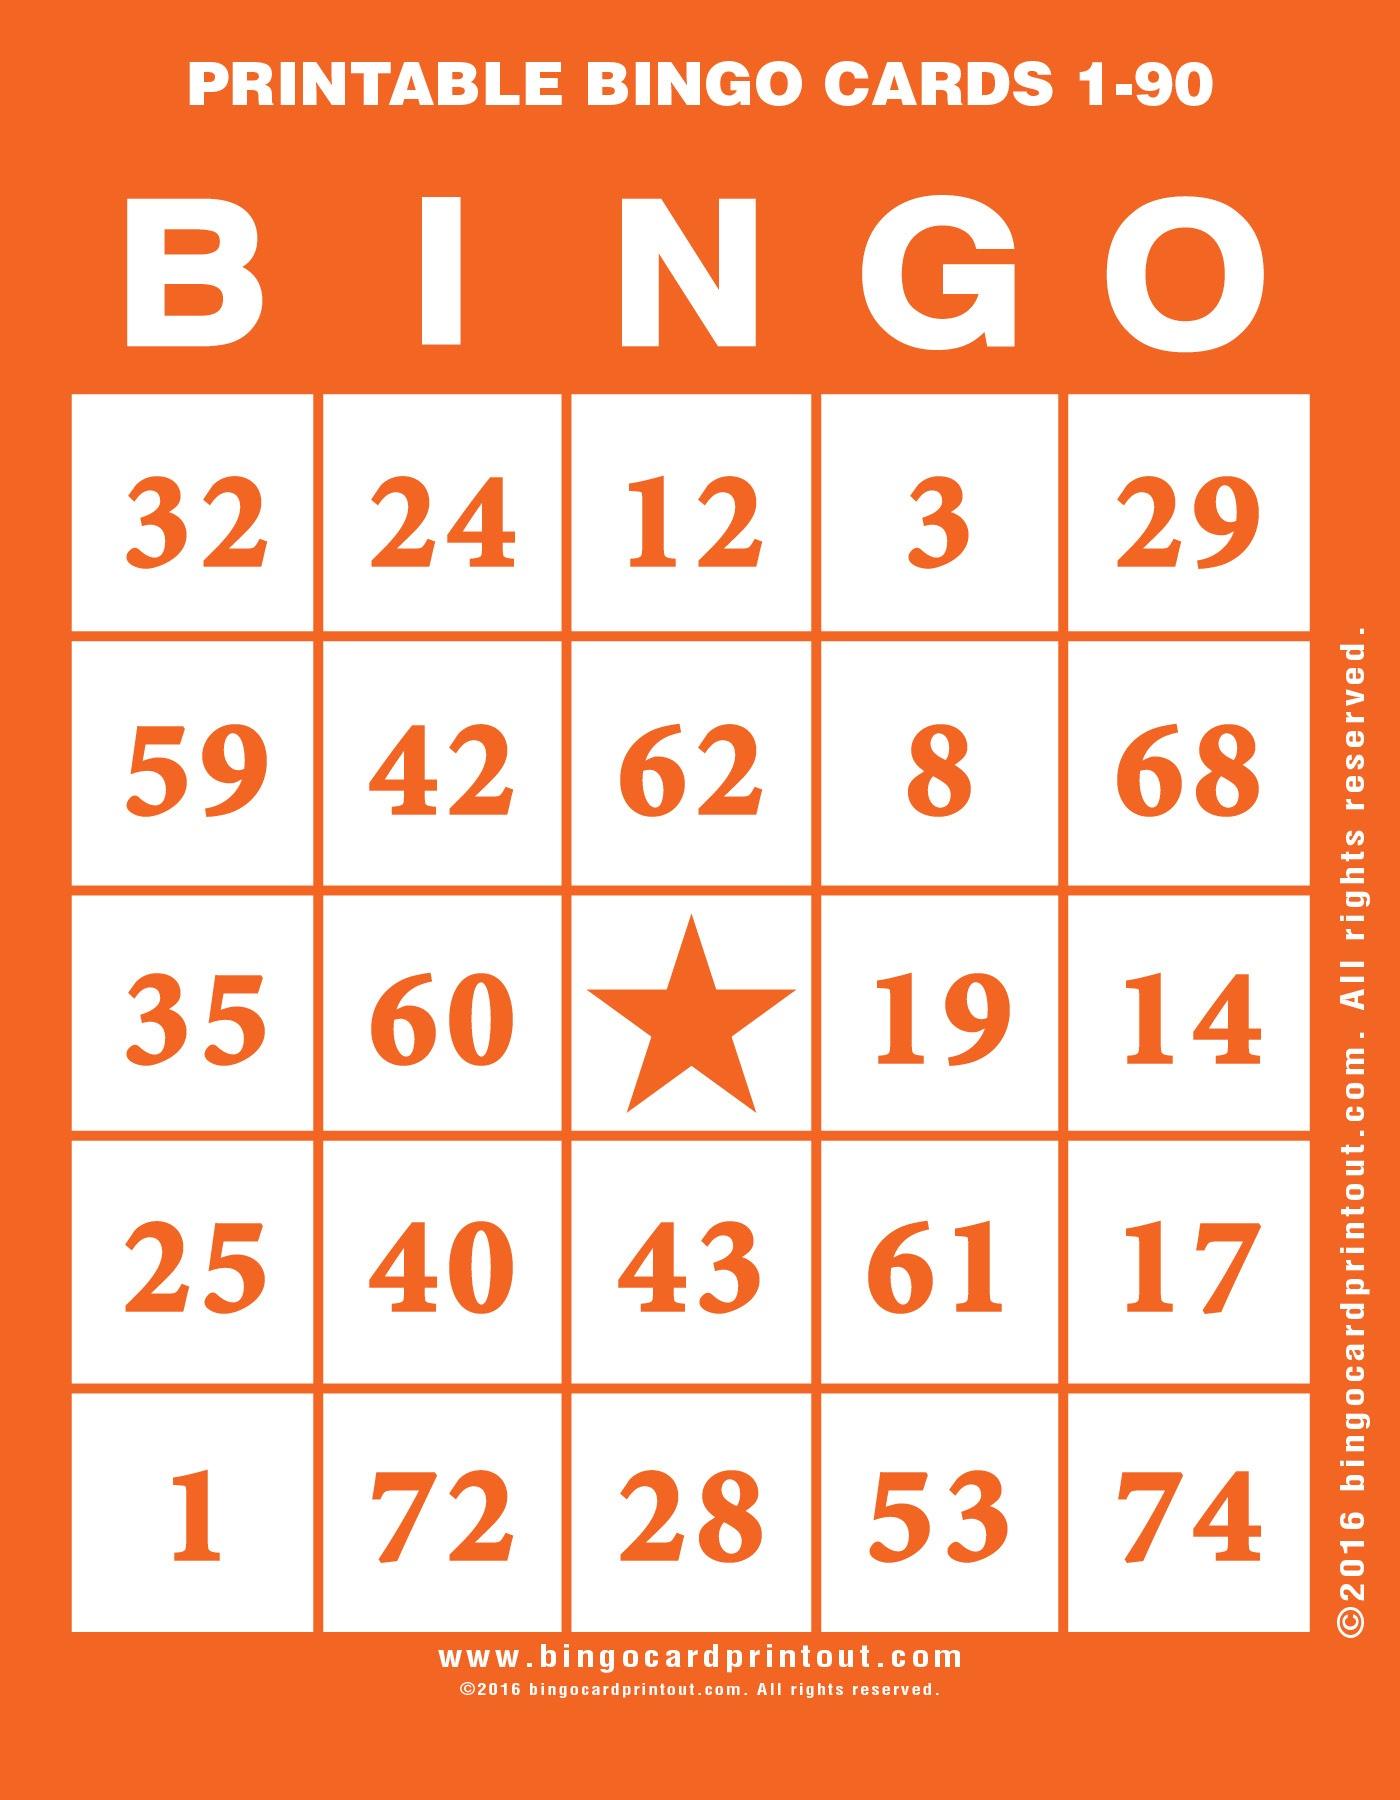 Printable Bingo Cards 1-90 - Bingocardprintout - Free Printable Bingo Cards